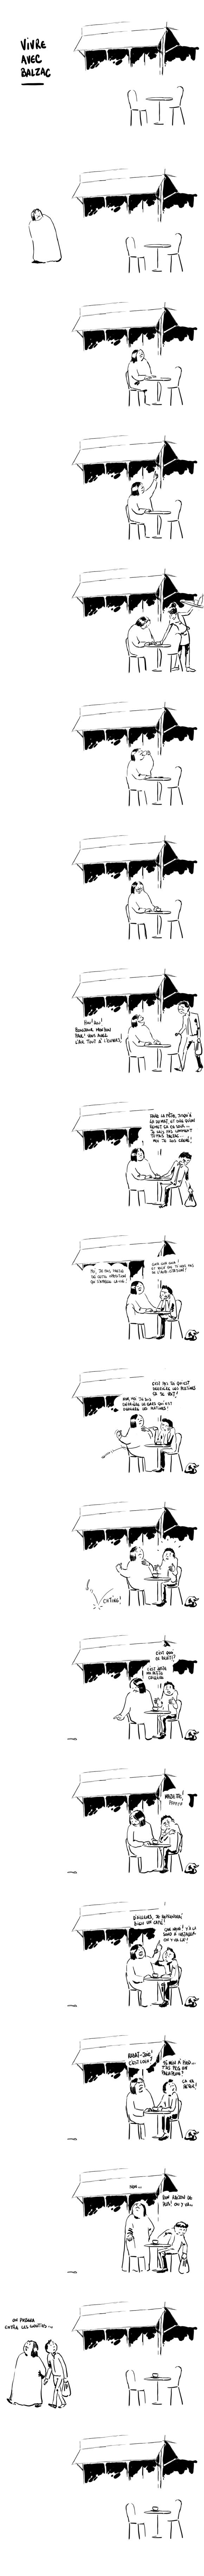 vivre-avec-Balzac-en-2015